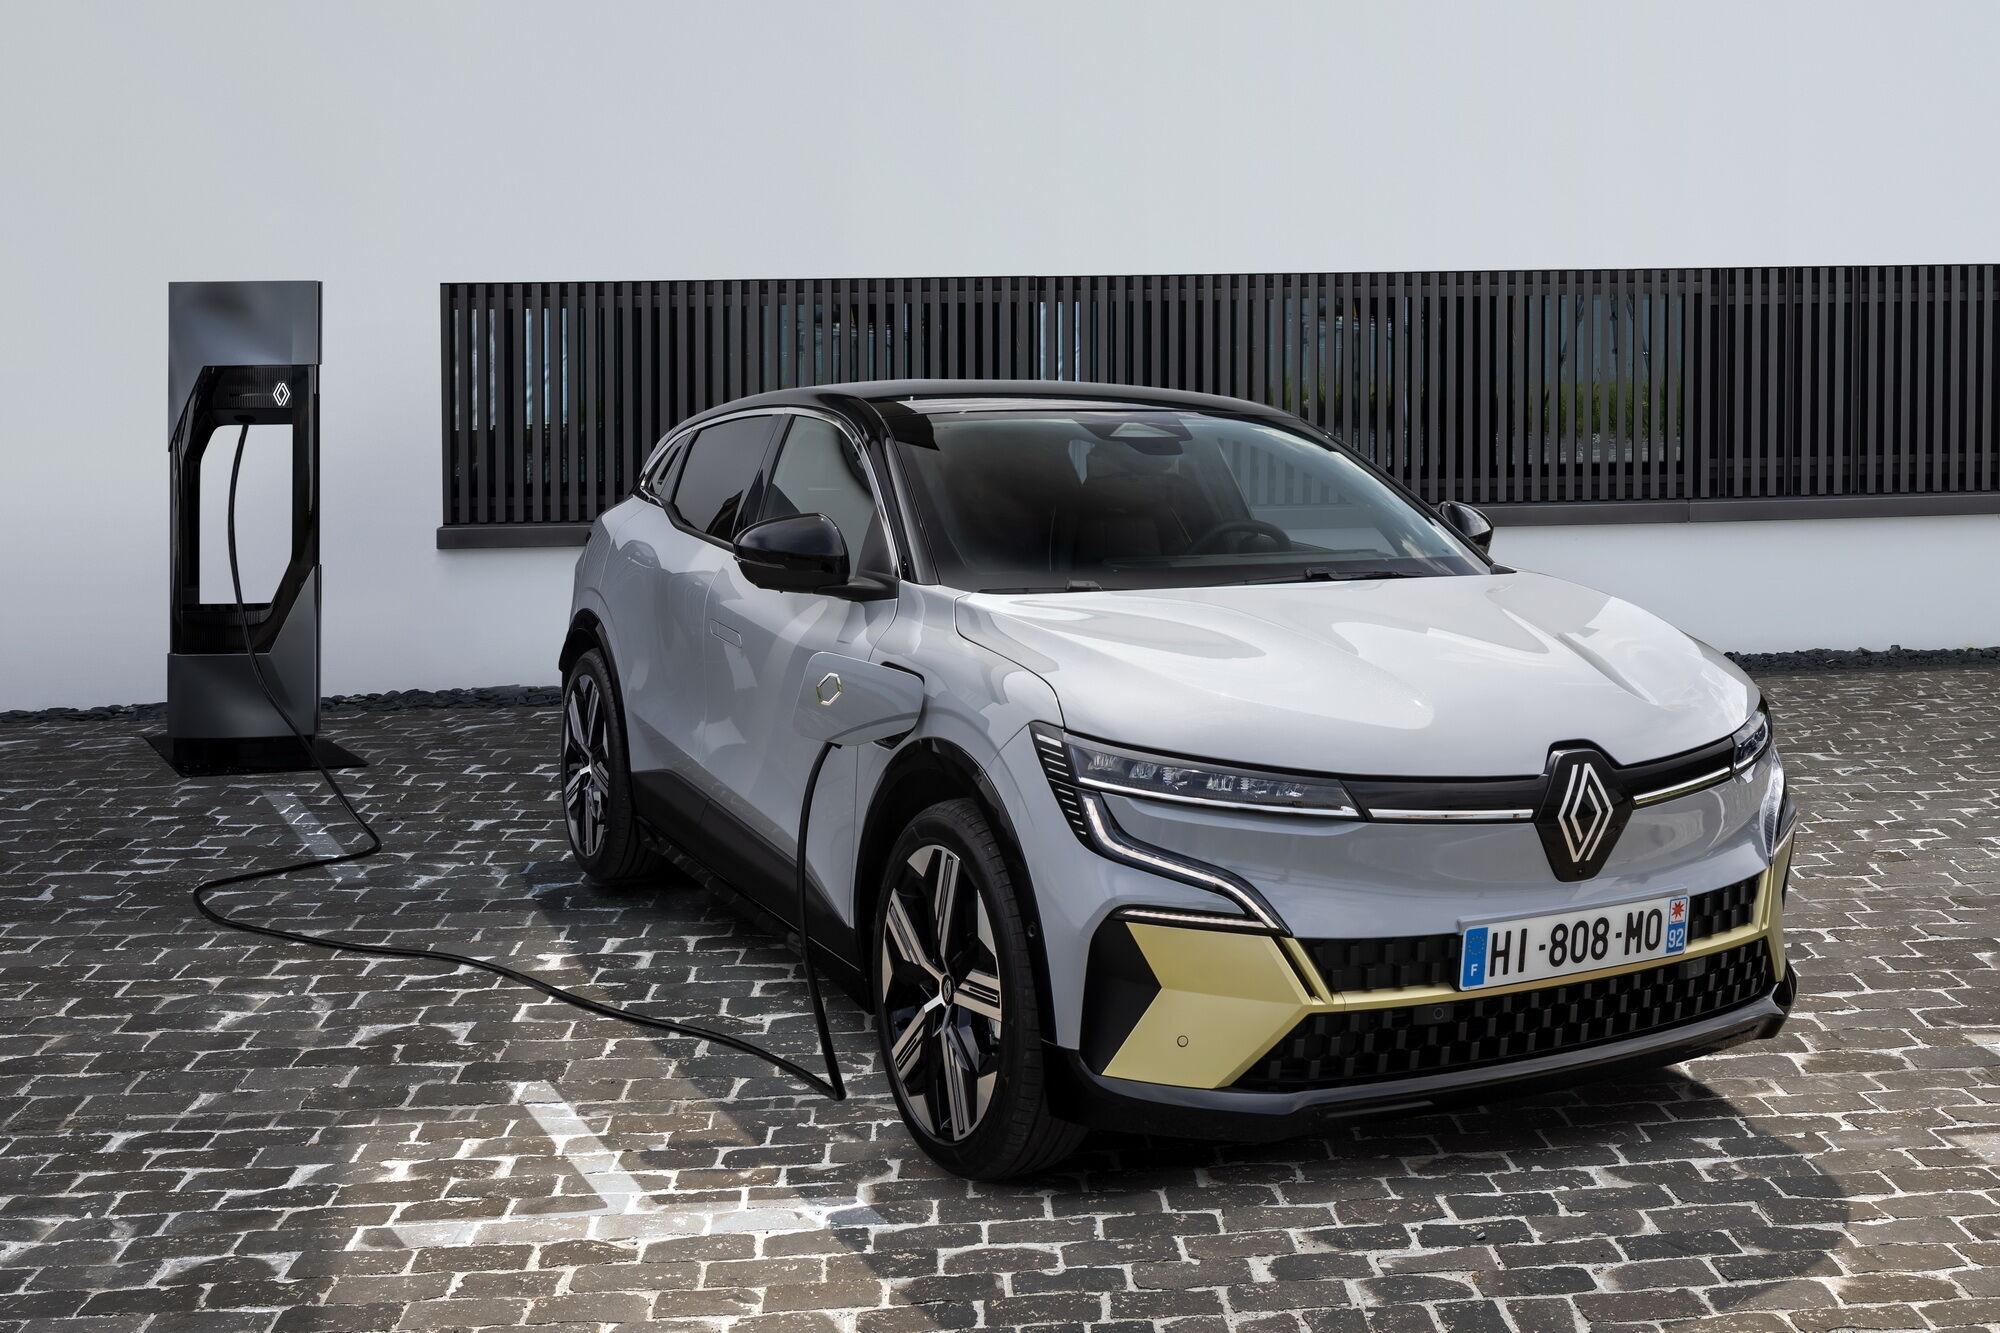 Новый Renault Megane стал электромобилем